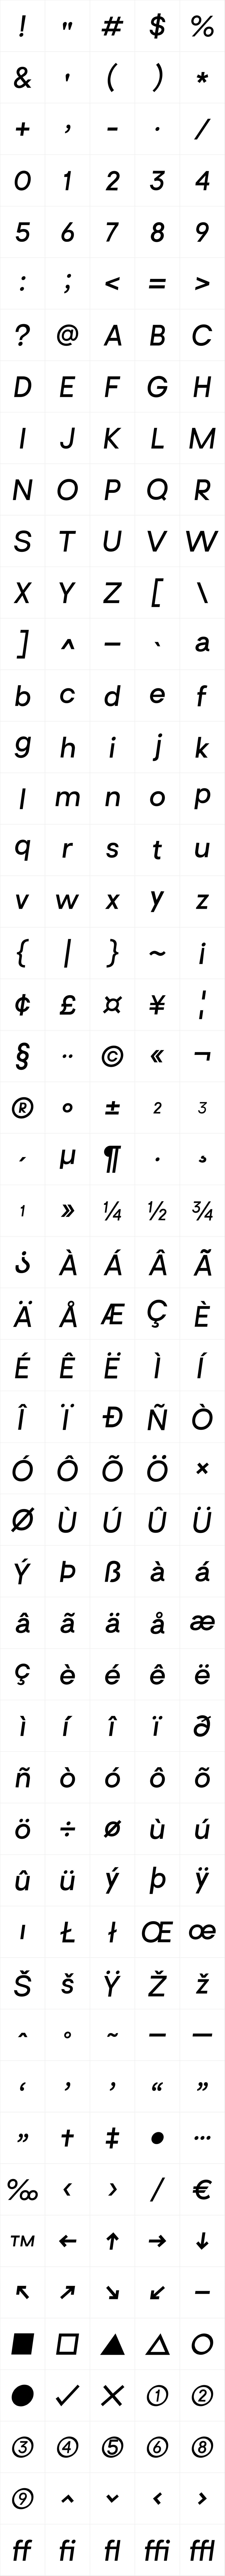 Brasley SemiBold Italic